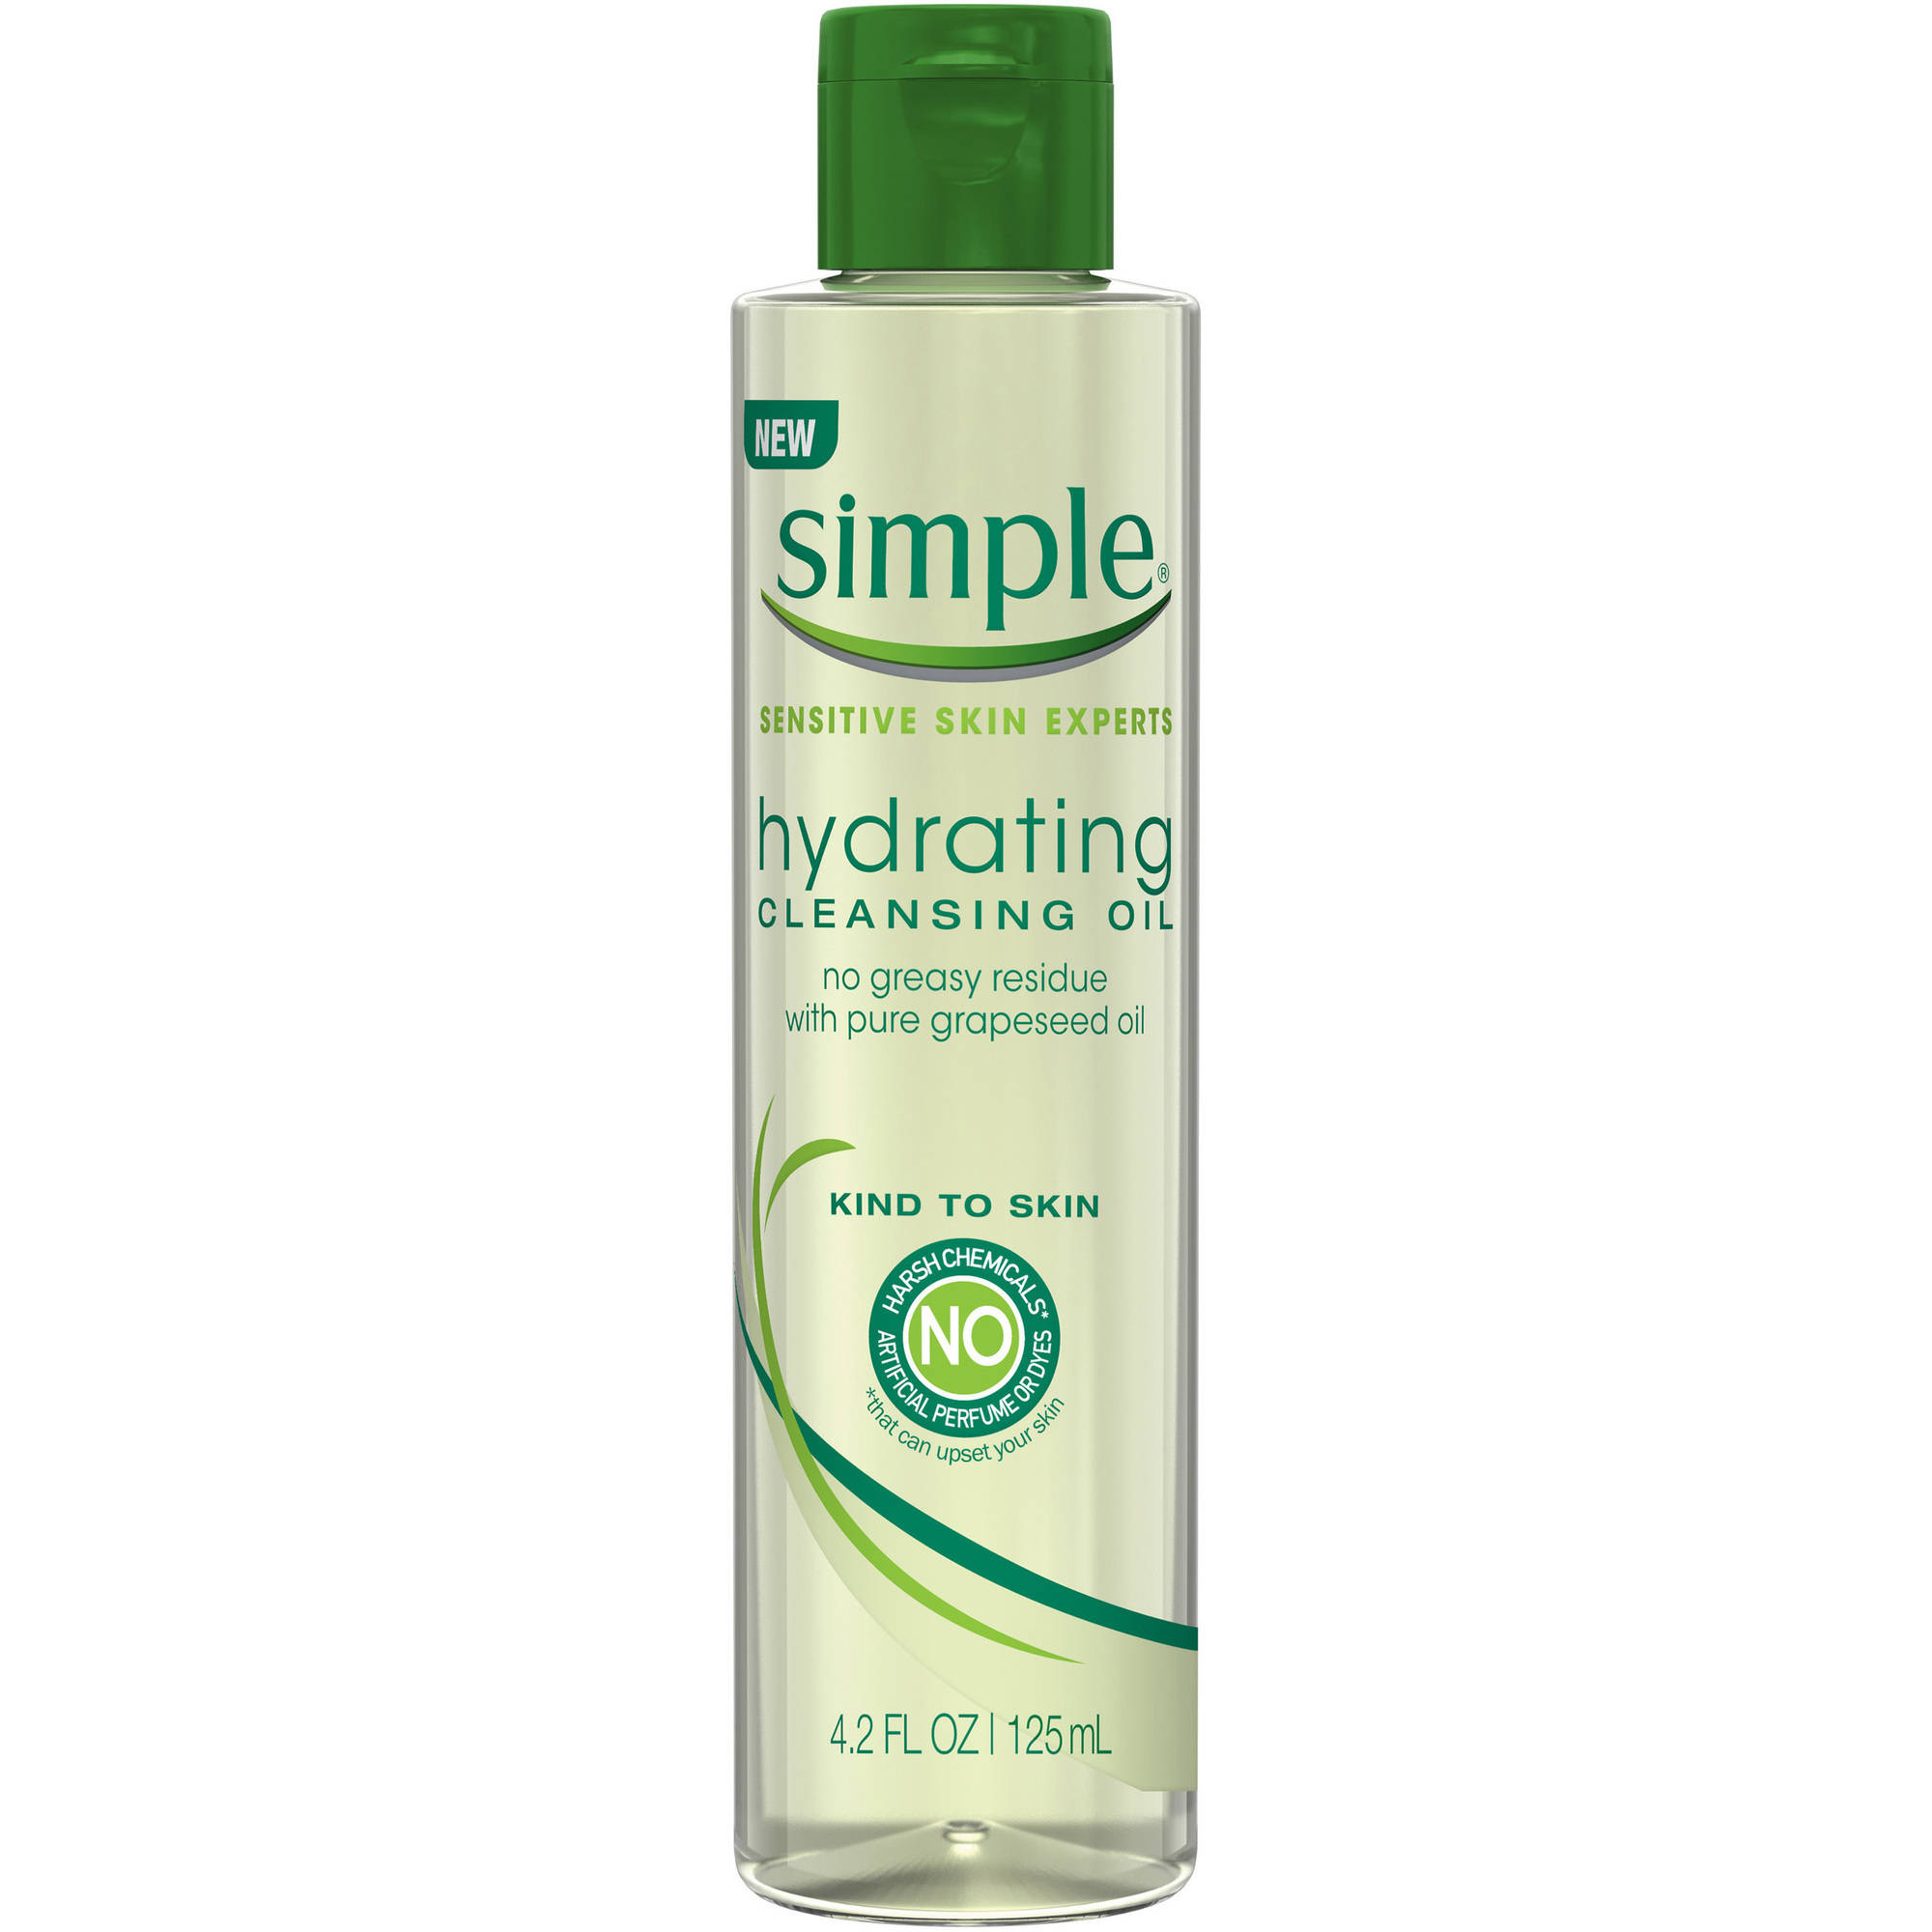 Unilever Simple Sensitive Skin Experts Hydrating Cleansing Oil, 4.2 Fl Oz